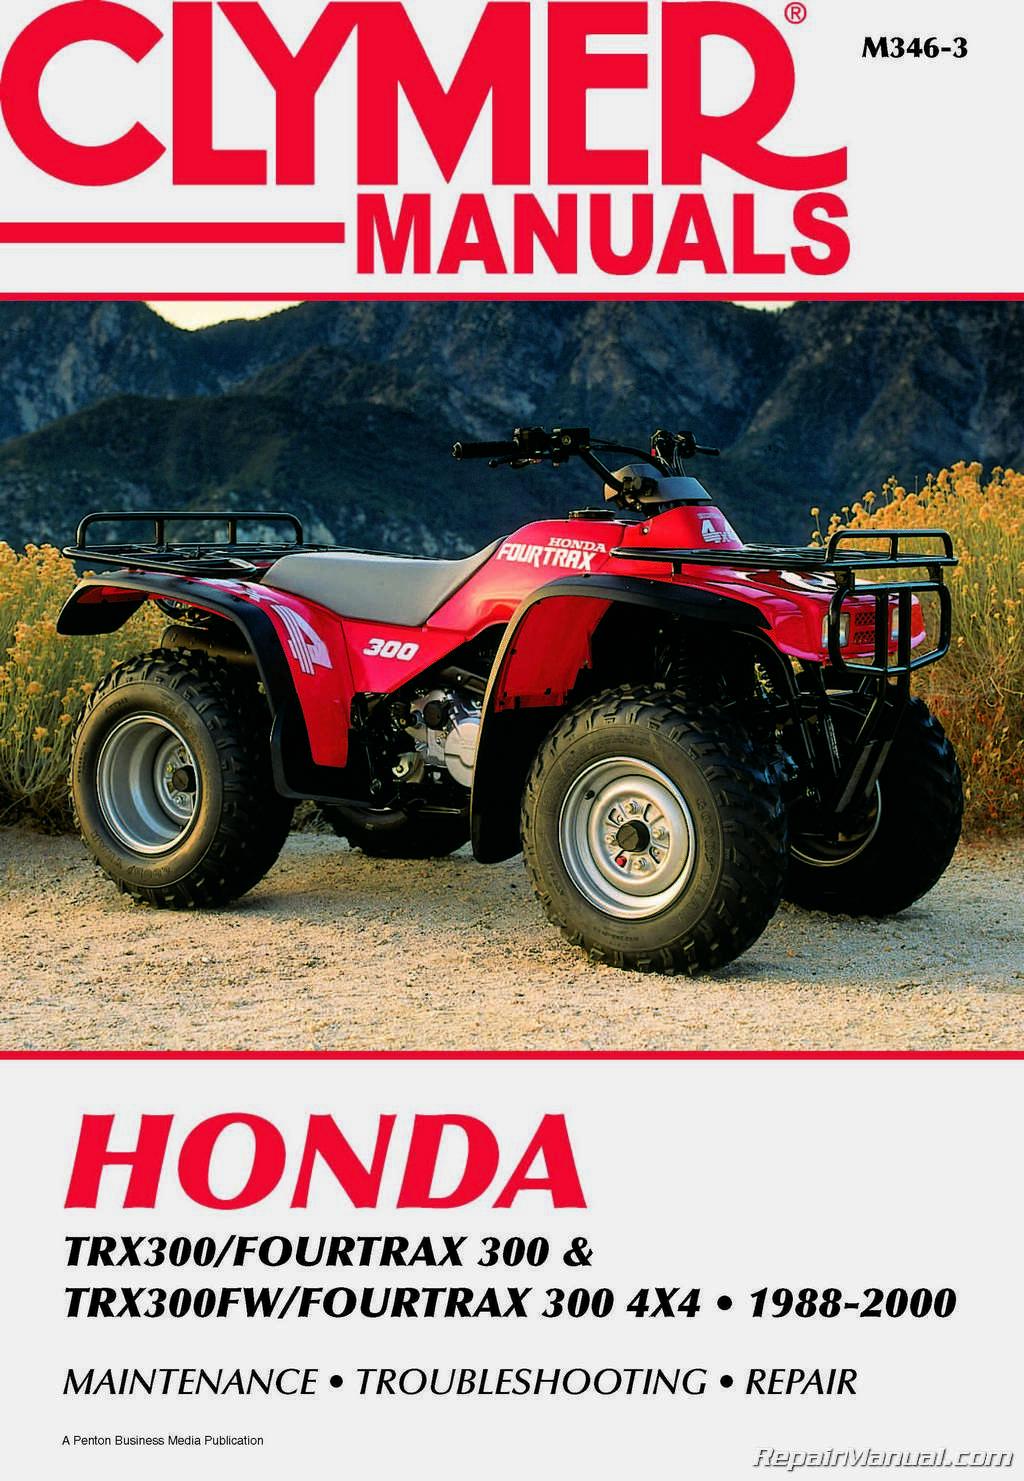 1997 honda fourtrax 300 owners manual pdf